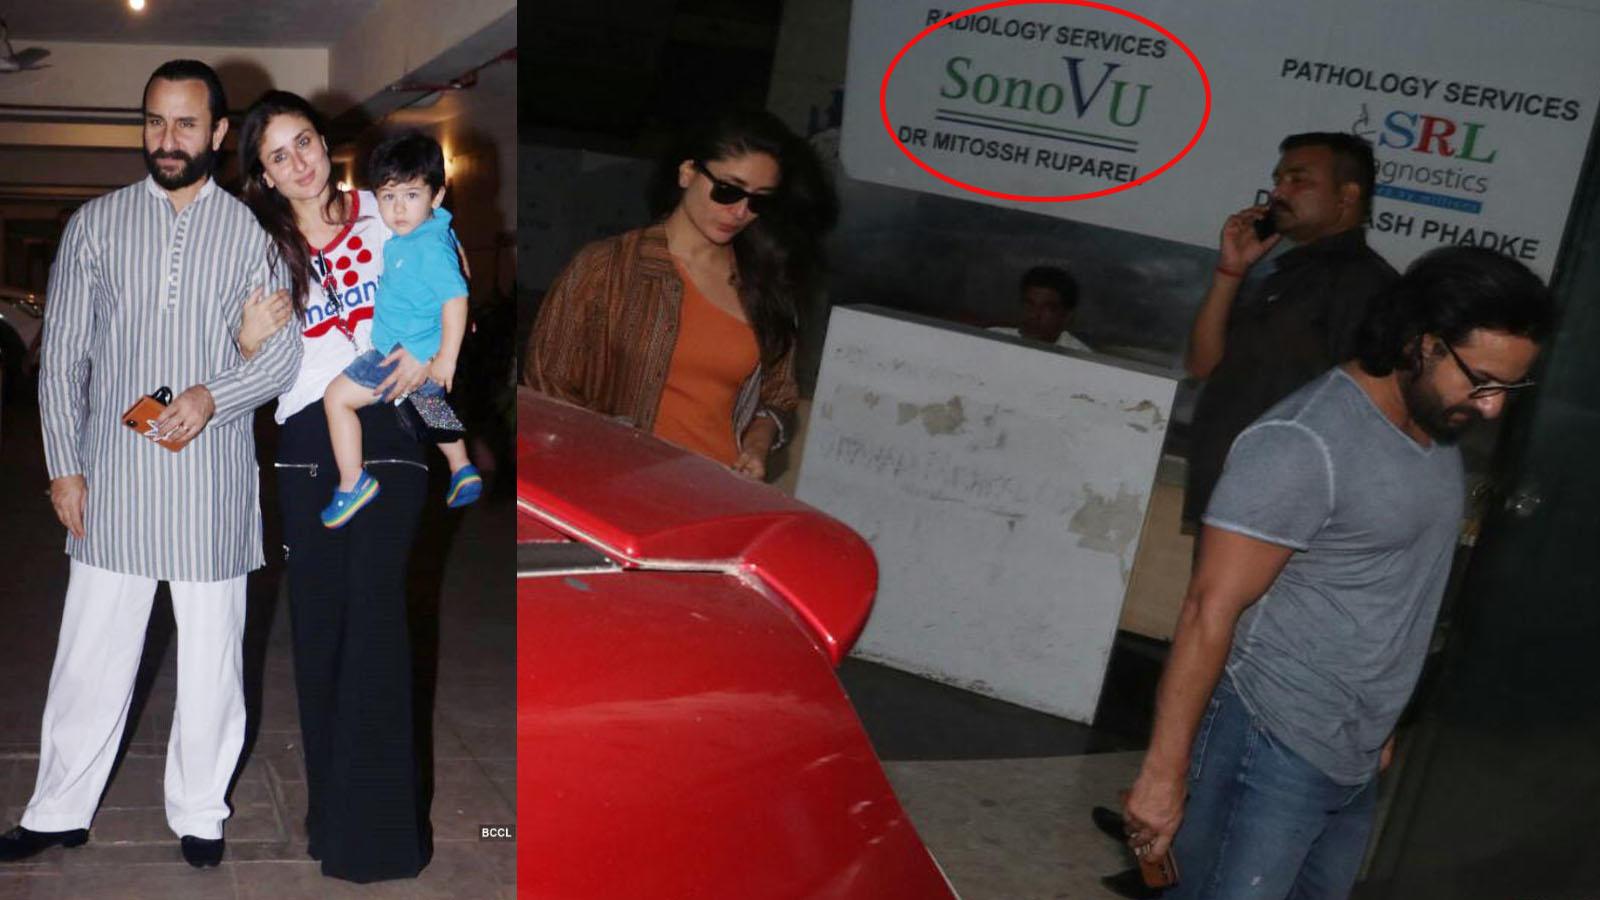 Fans suspect pregnancy as Kareena Kapoor Khan and Saif Ali Khan spotted outside clinic